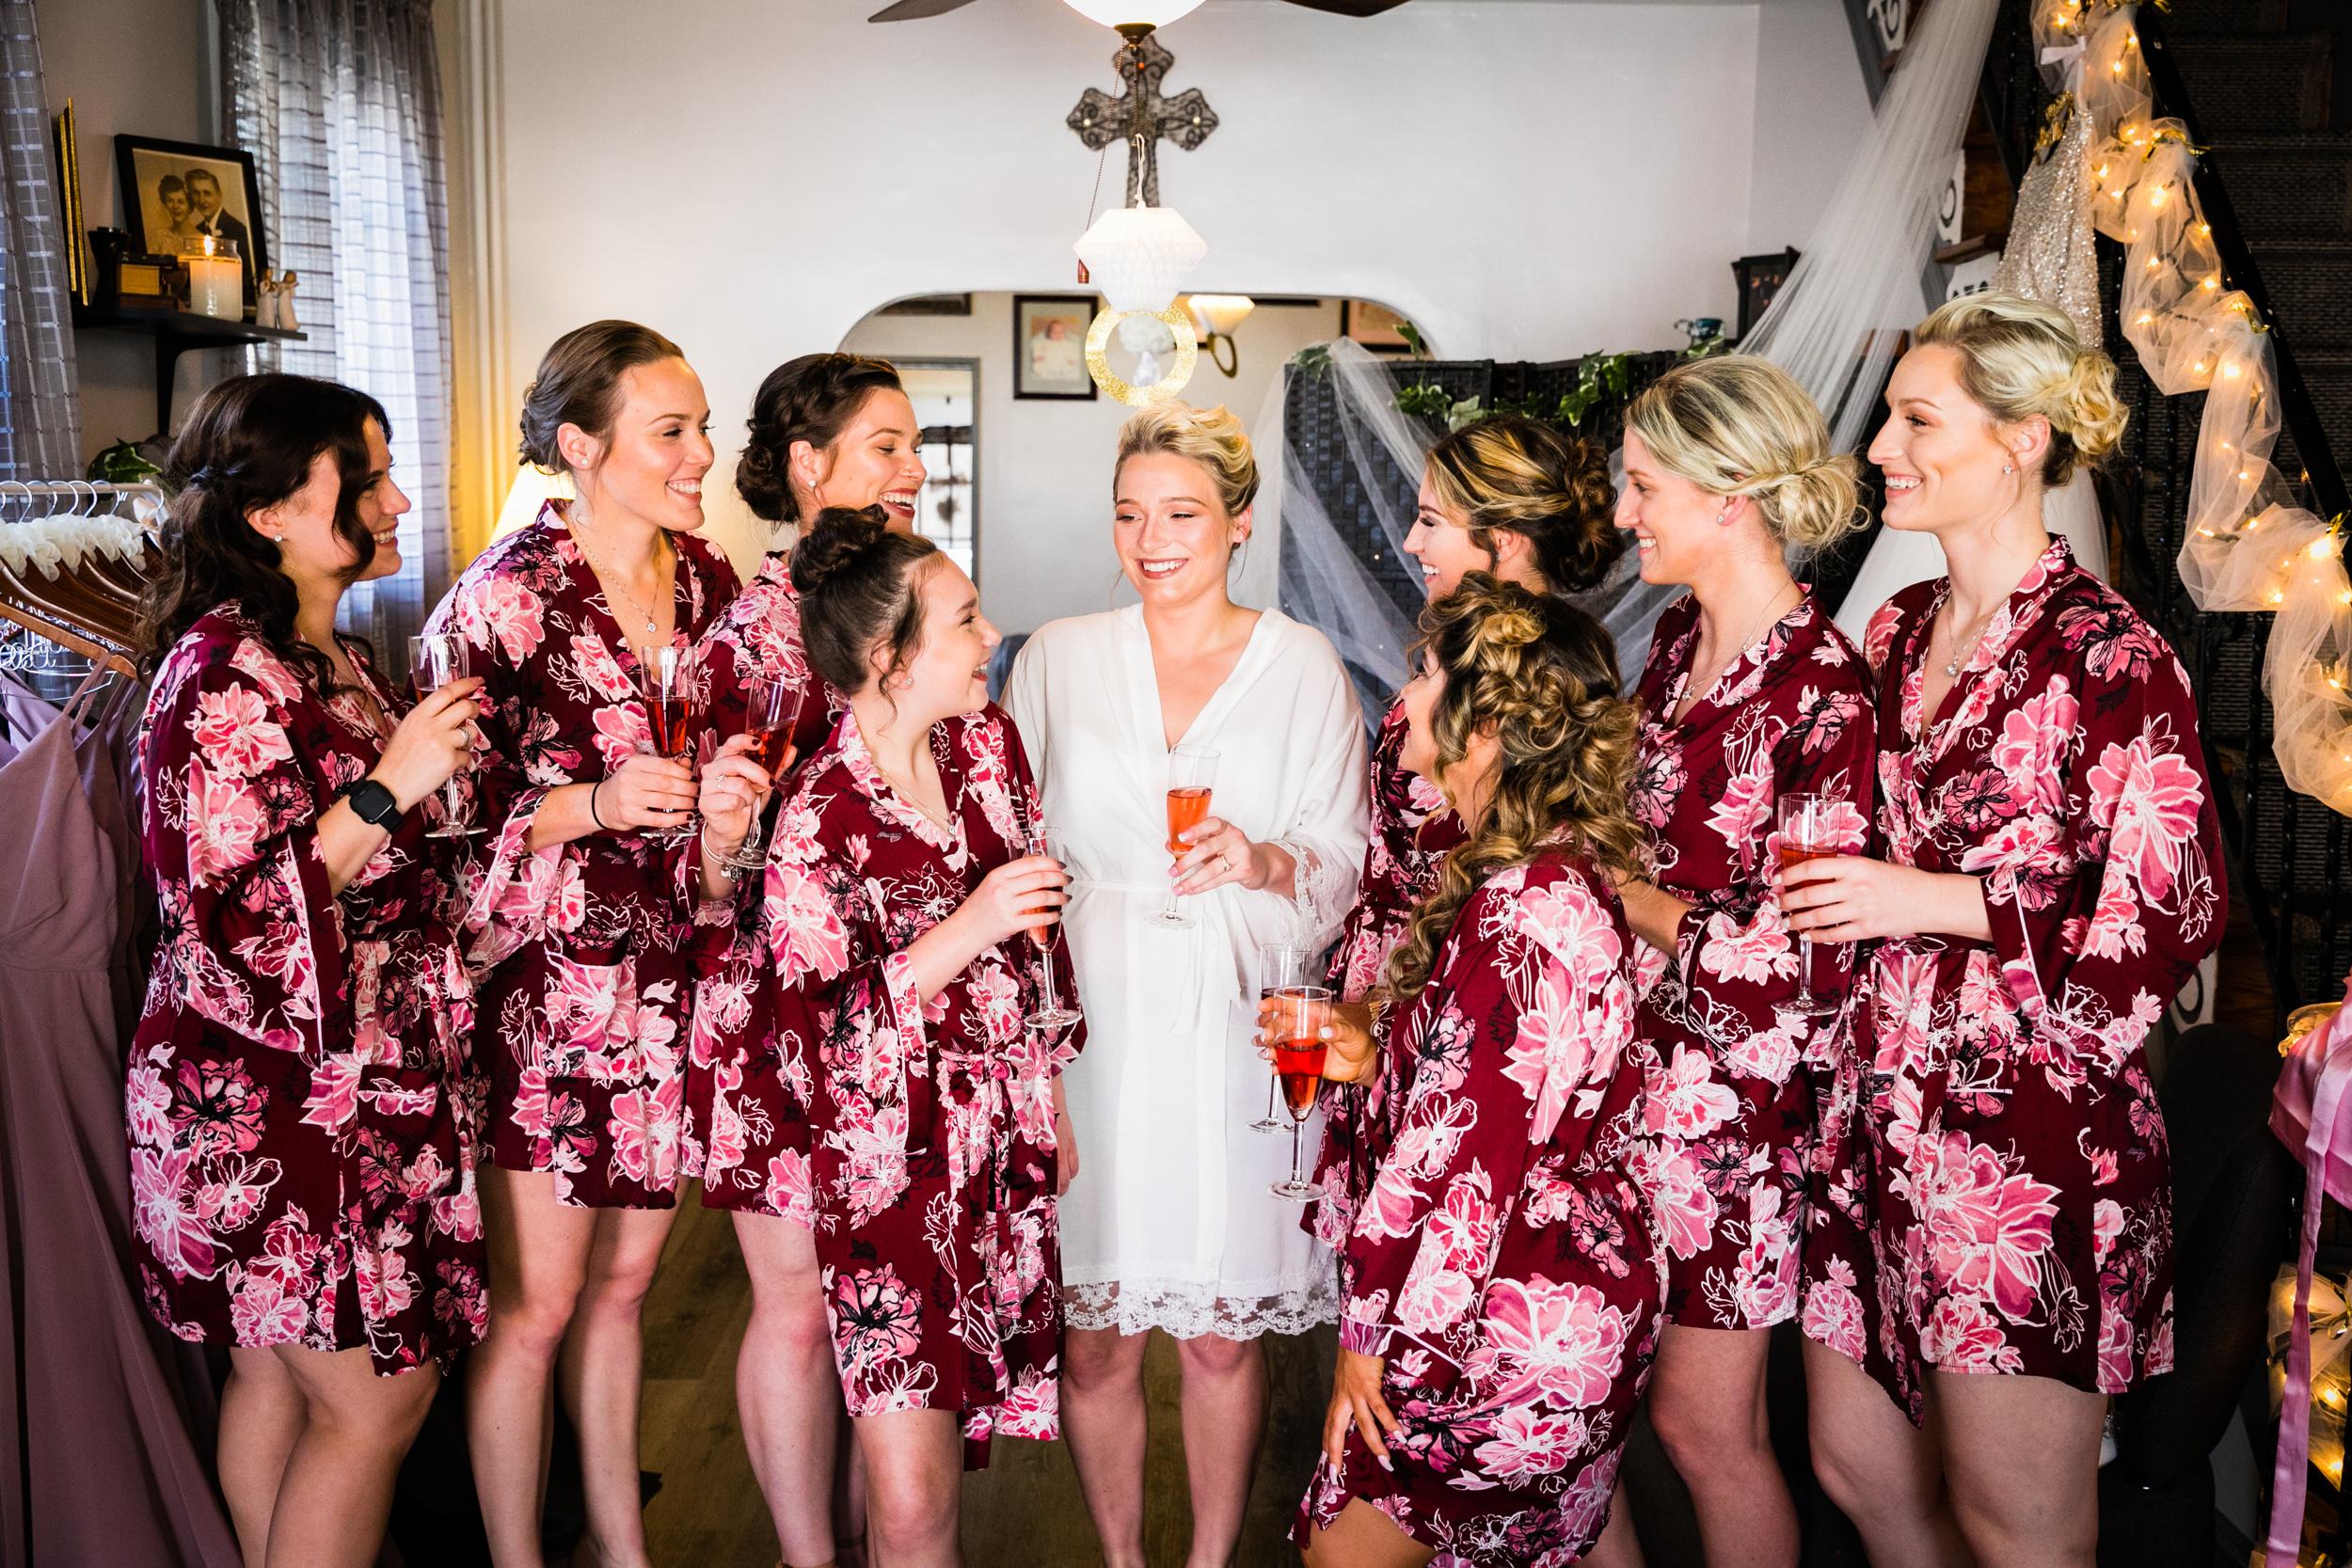 CELEBRATIONS BENSALEM WEDDING PHOTOGRAPHY-27.jpg